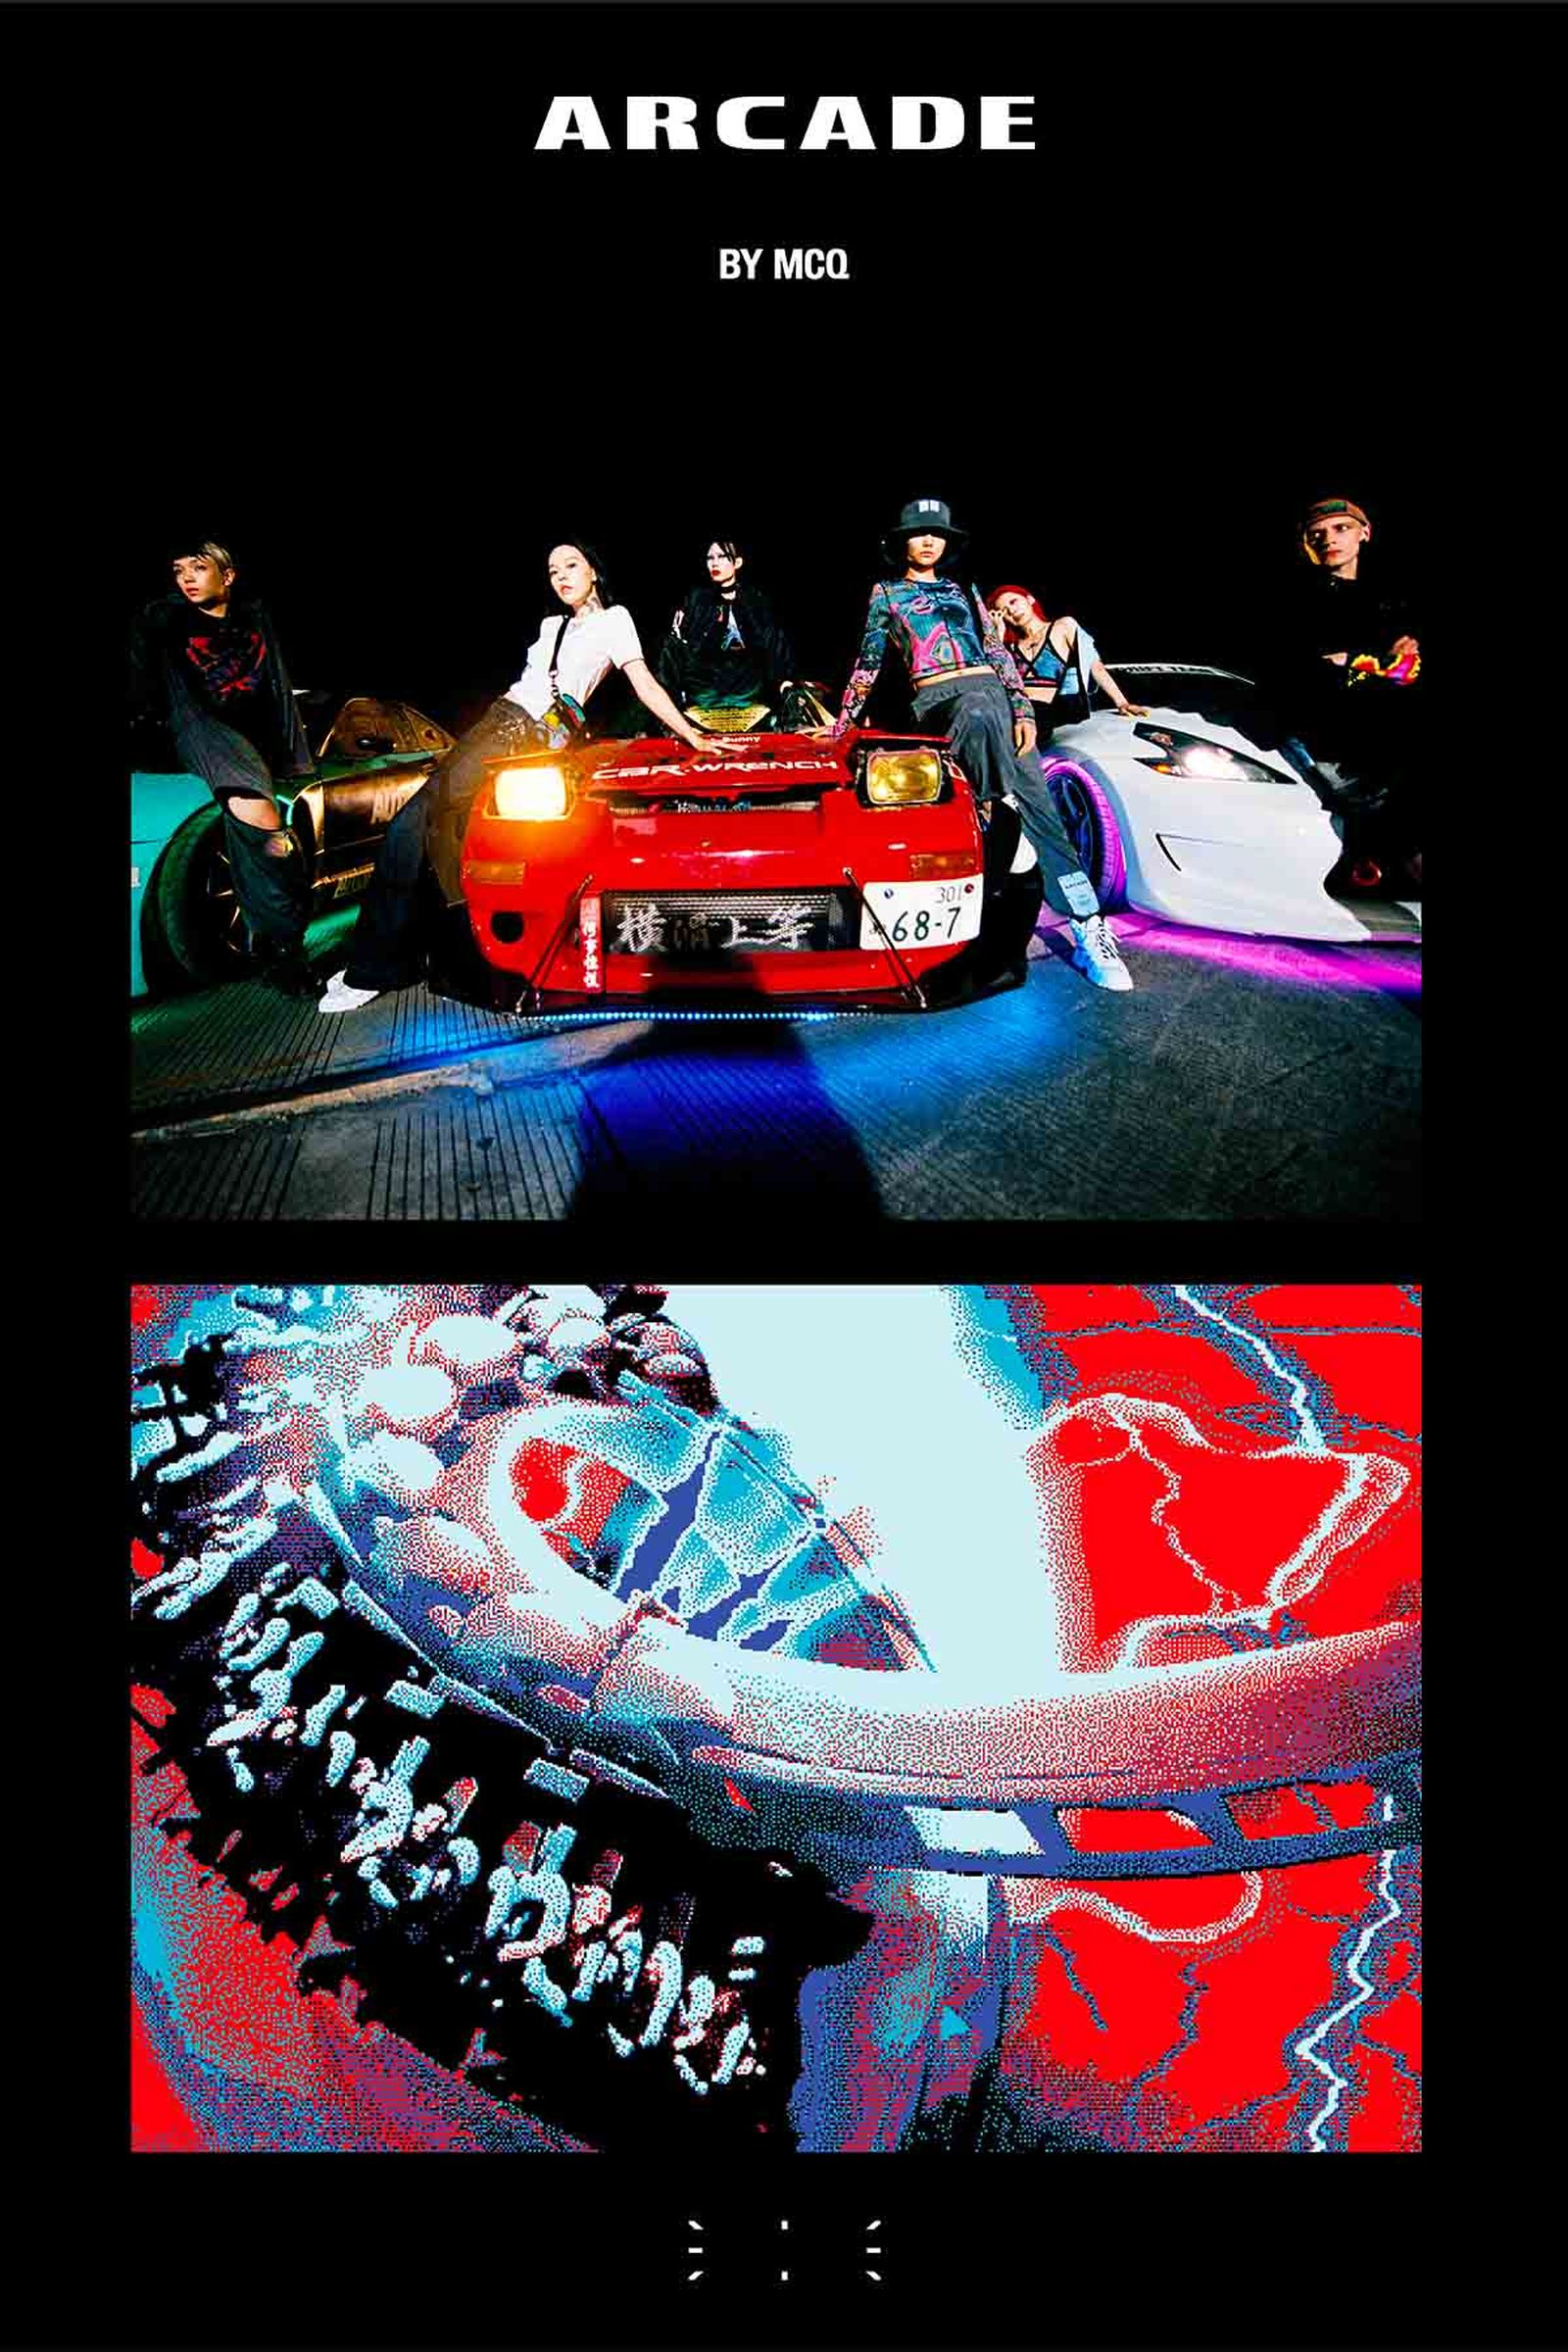 mcq-arcade-07